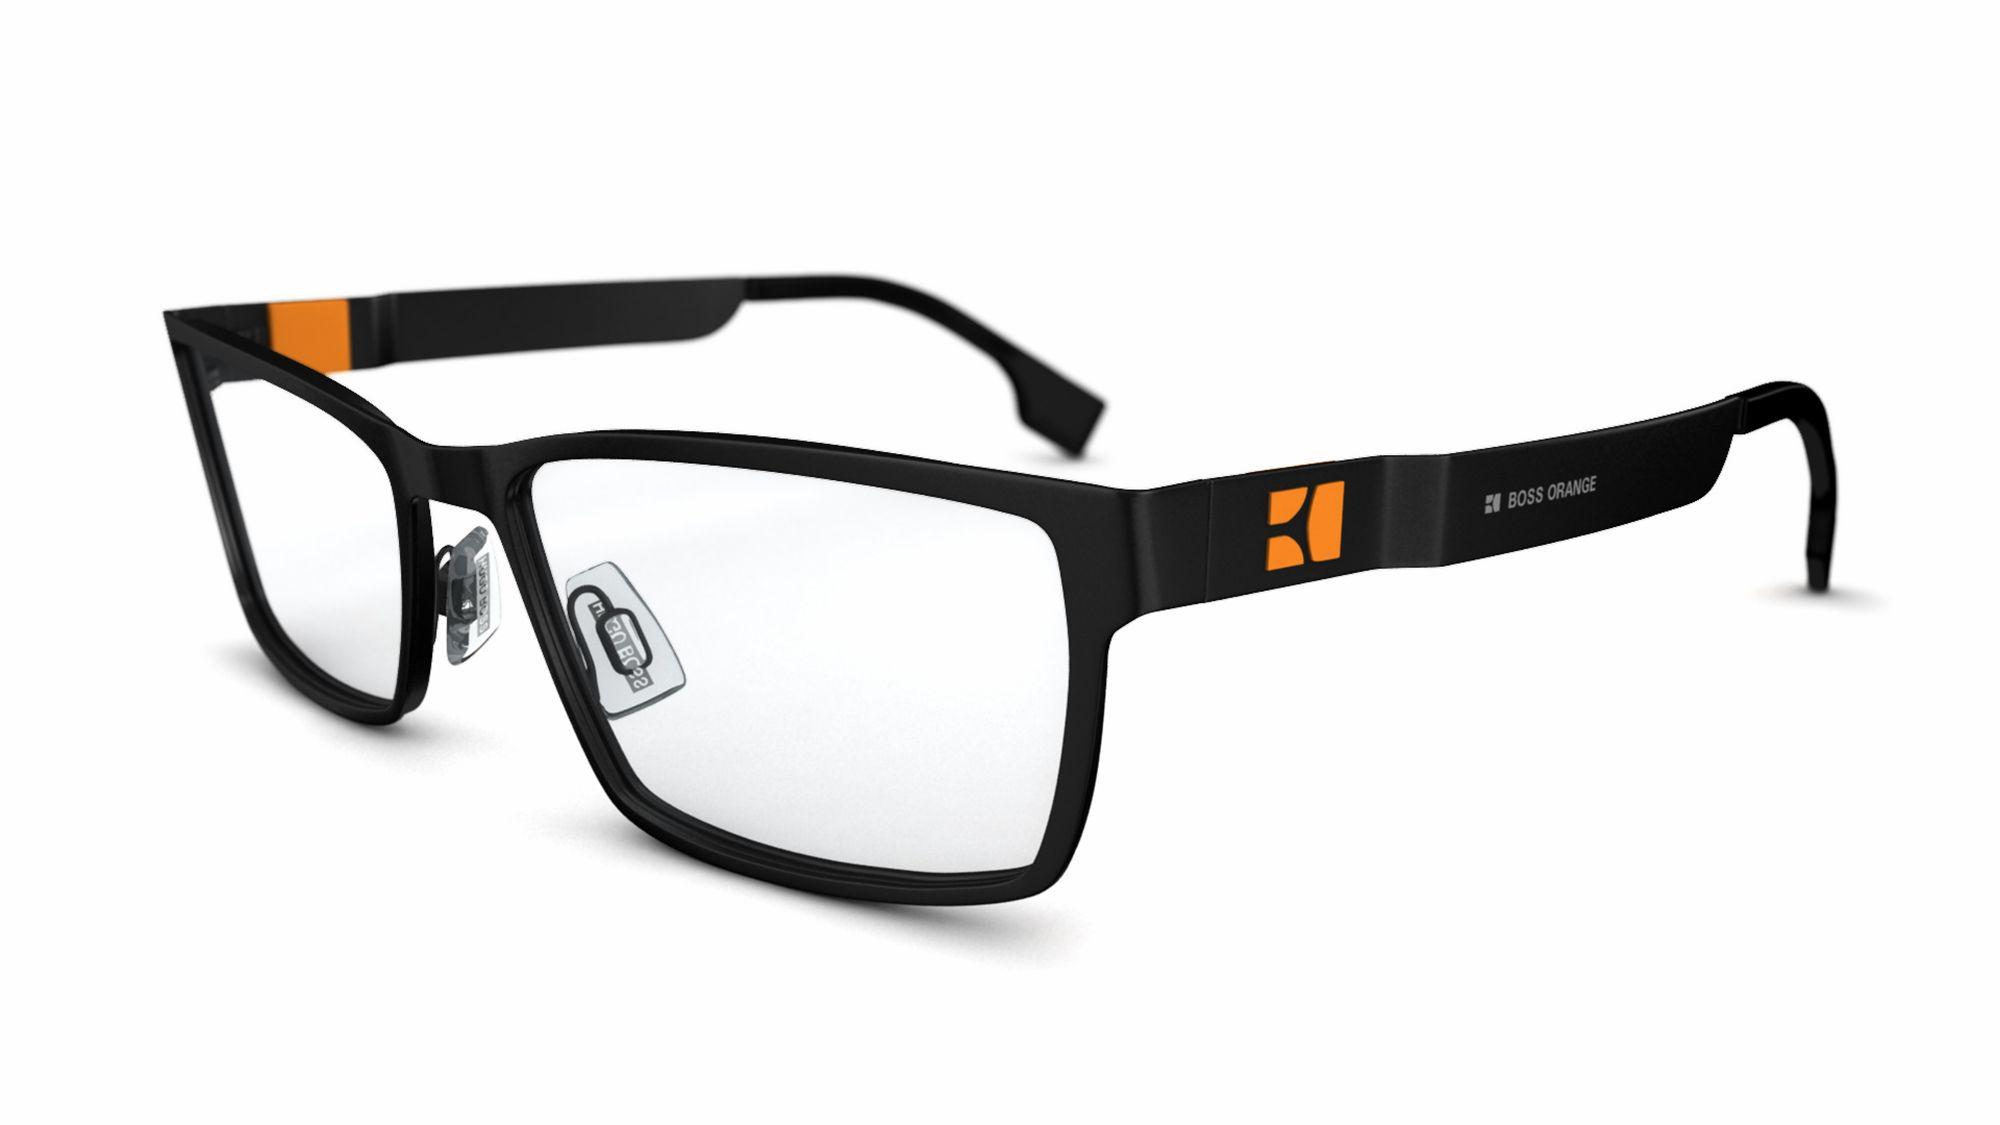 4e48e474453b BOSS Orange glasses - BO 0001my new frames | Mens fashion | Boss ...